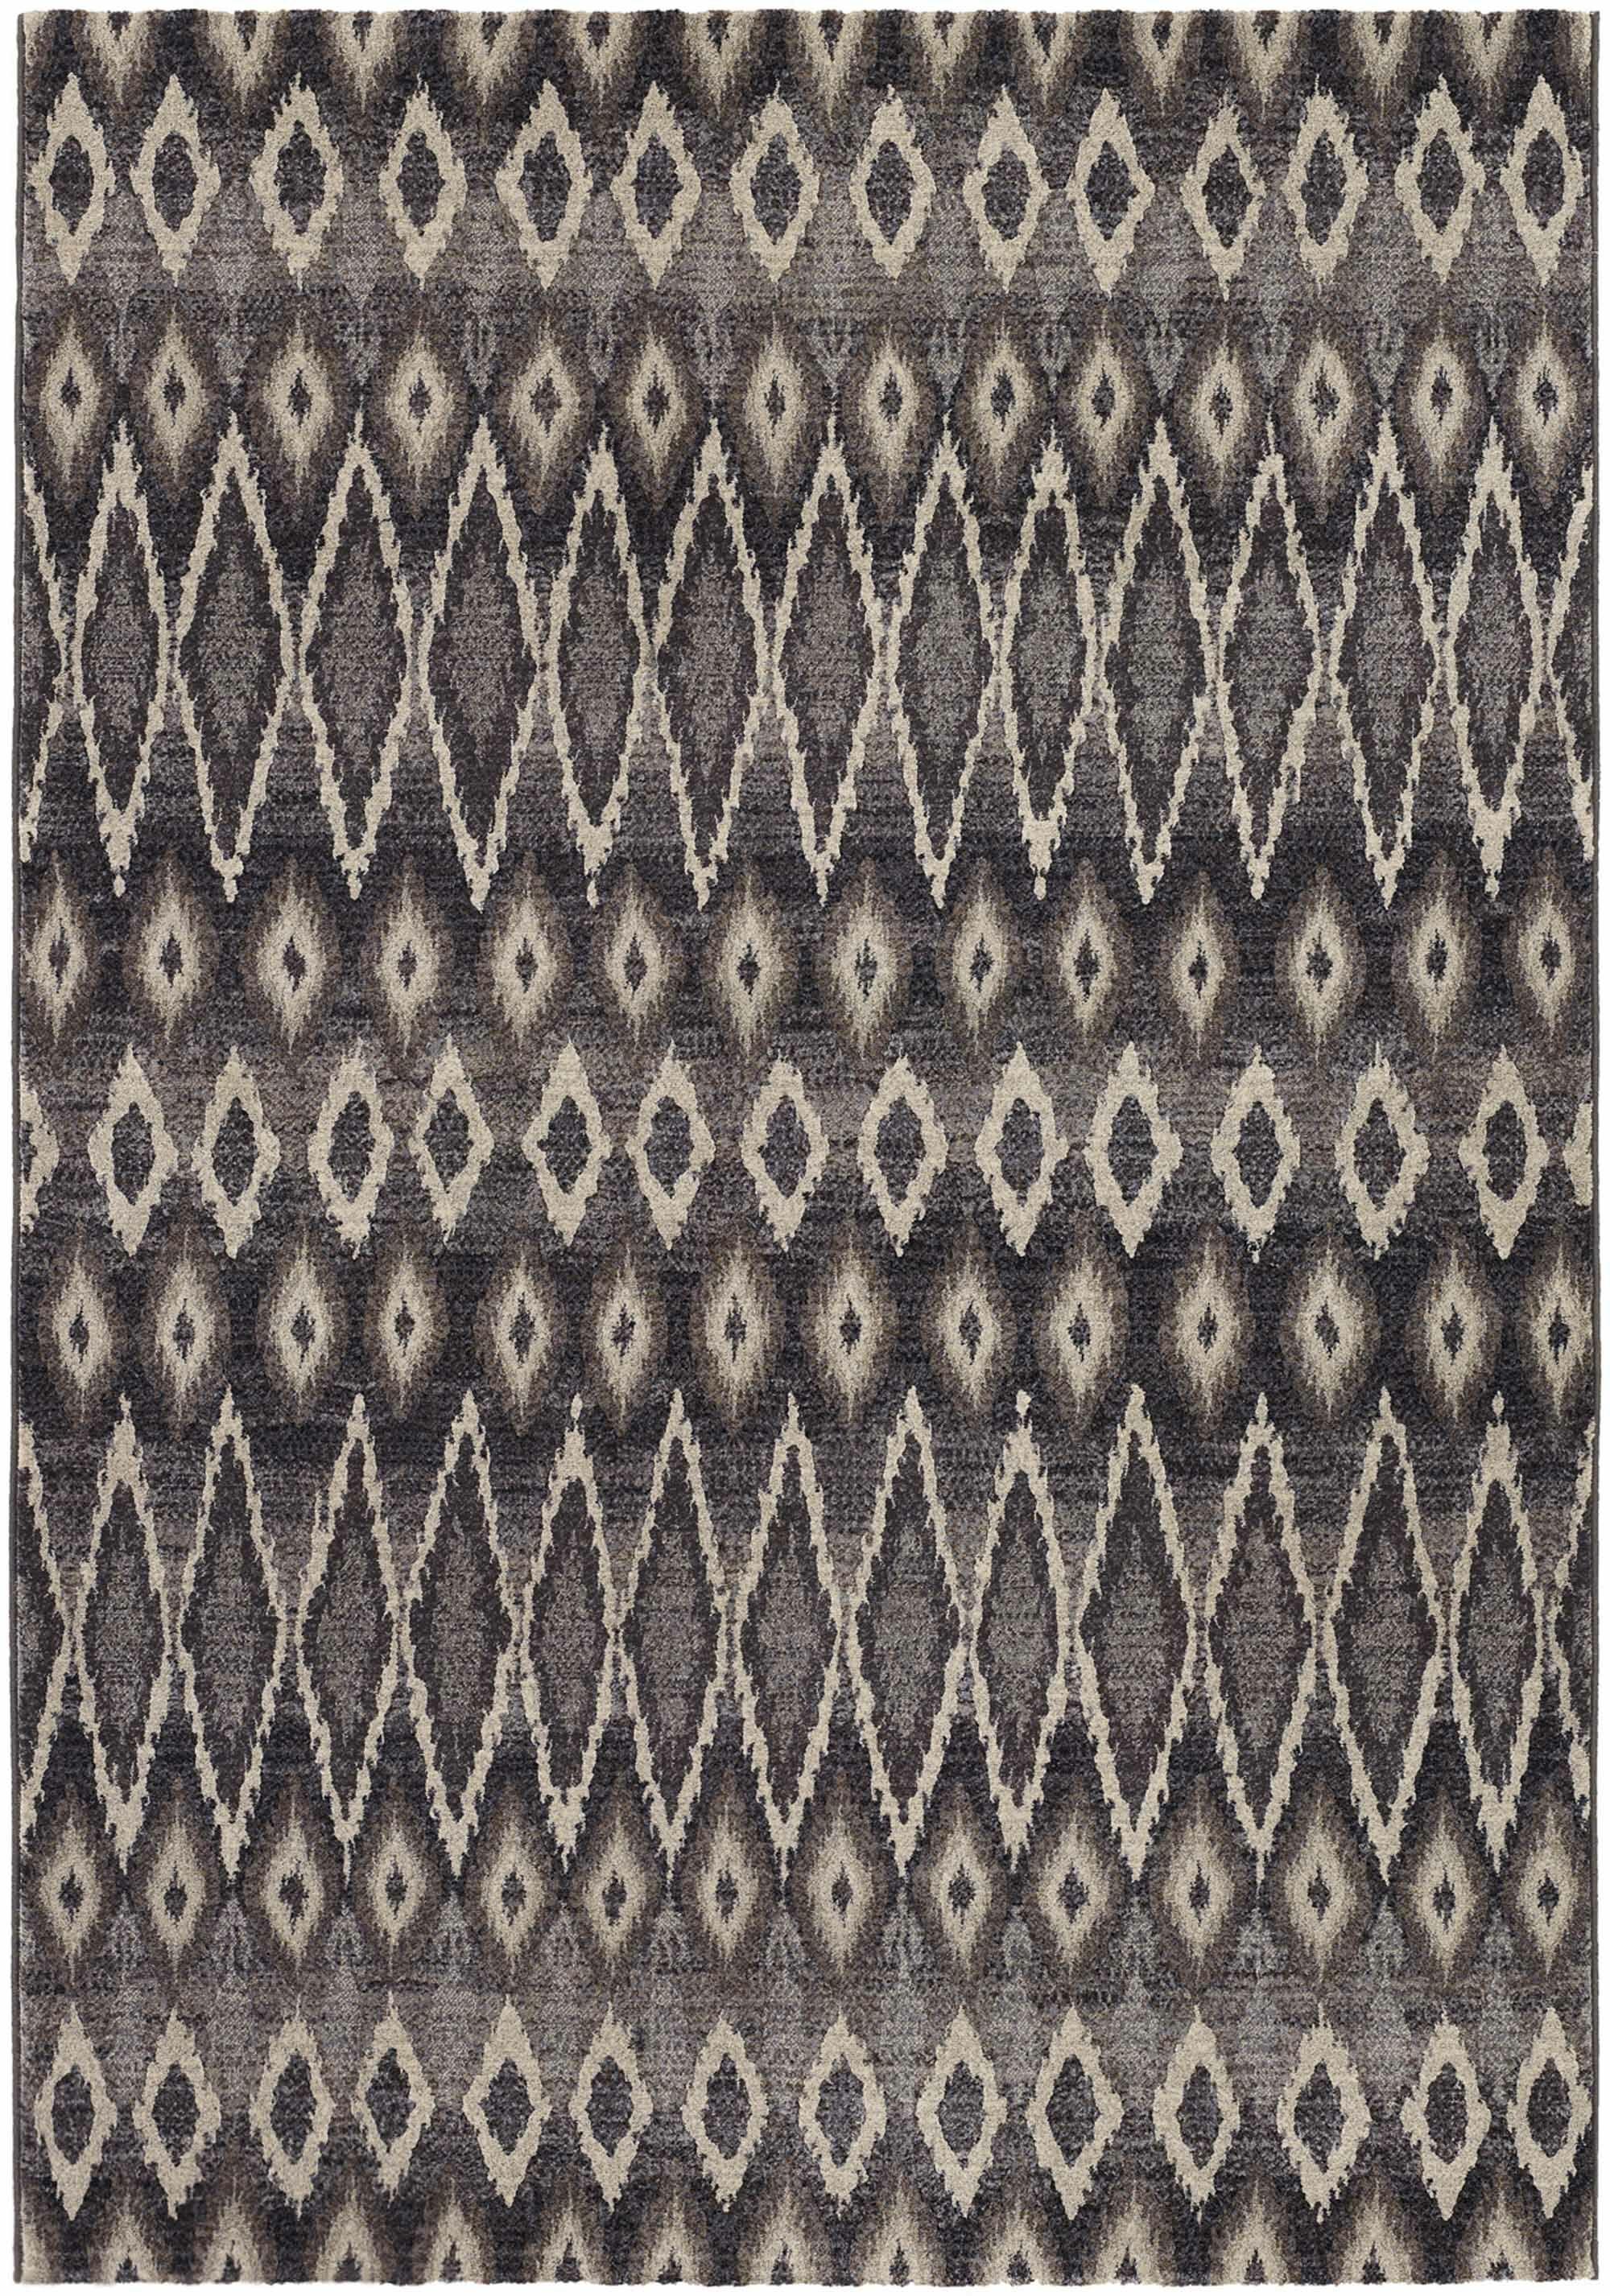 Sappington Gray Area Rug Rug Size: Rectangle 9'2